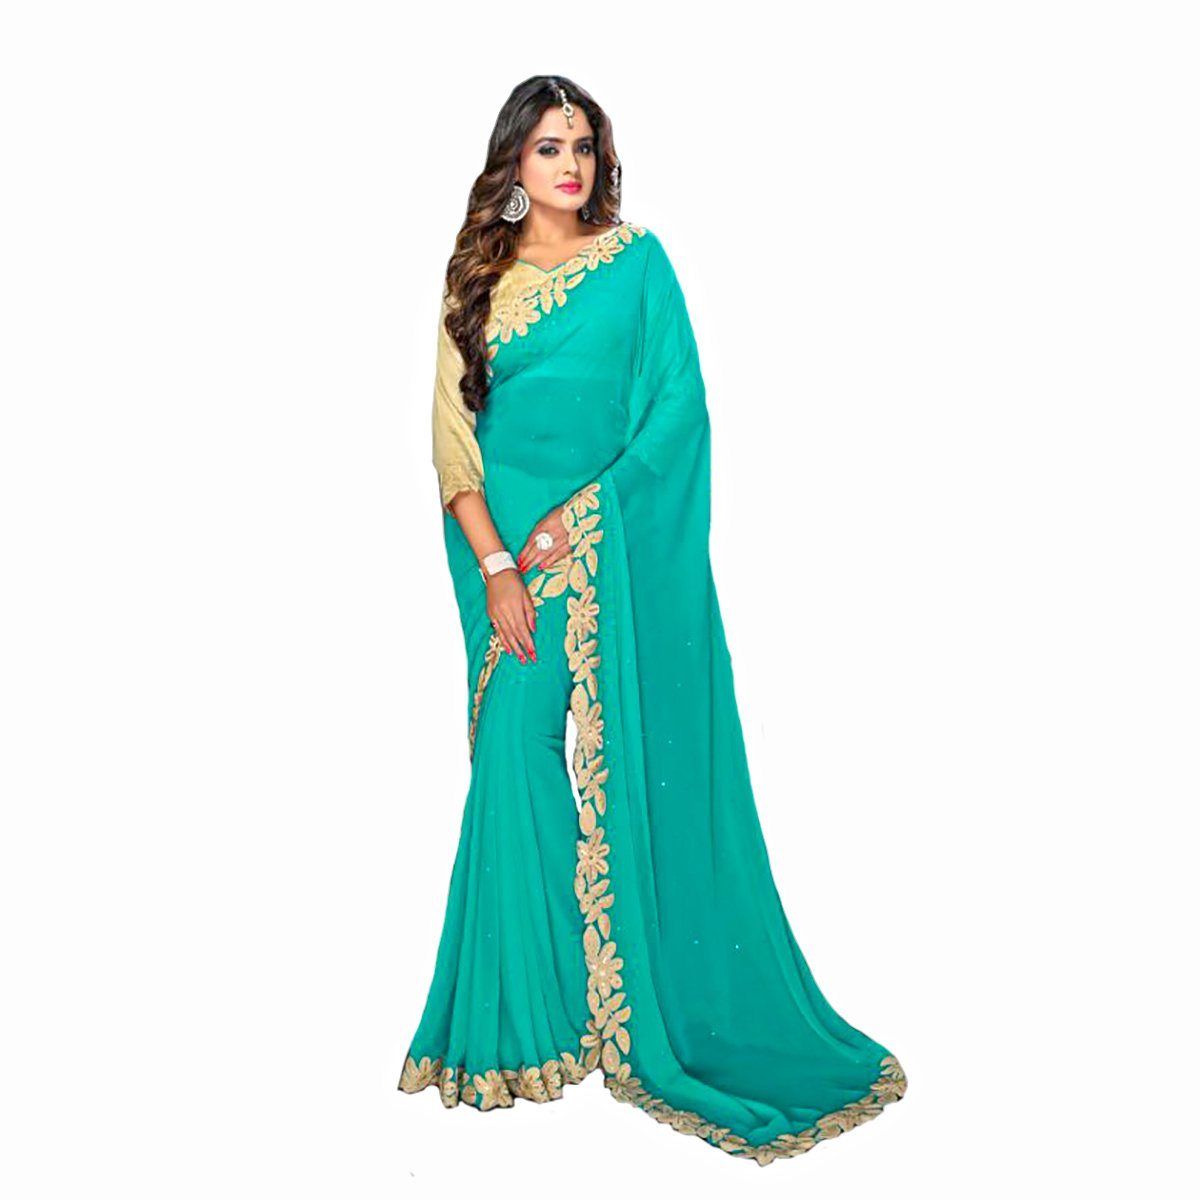 Bollywood Indian Bridal Wedding Sari Saree Designer Work Original Ethnic Traditional WhiteSexy New